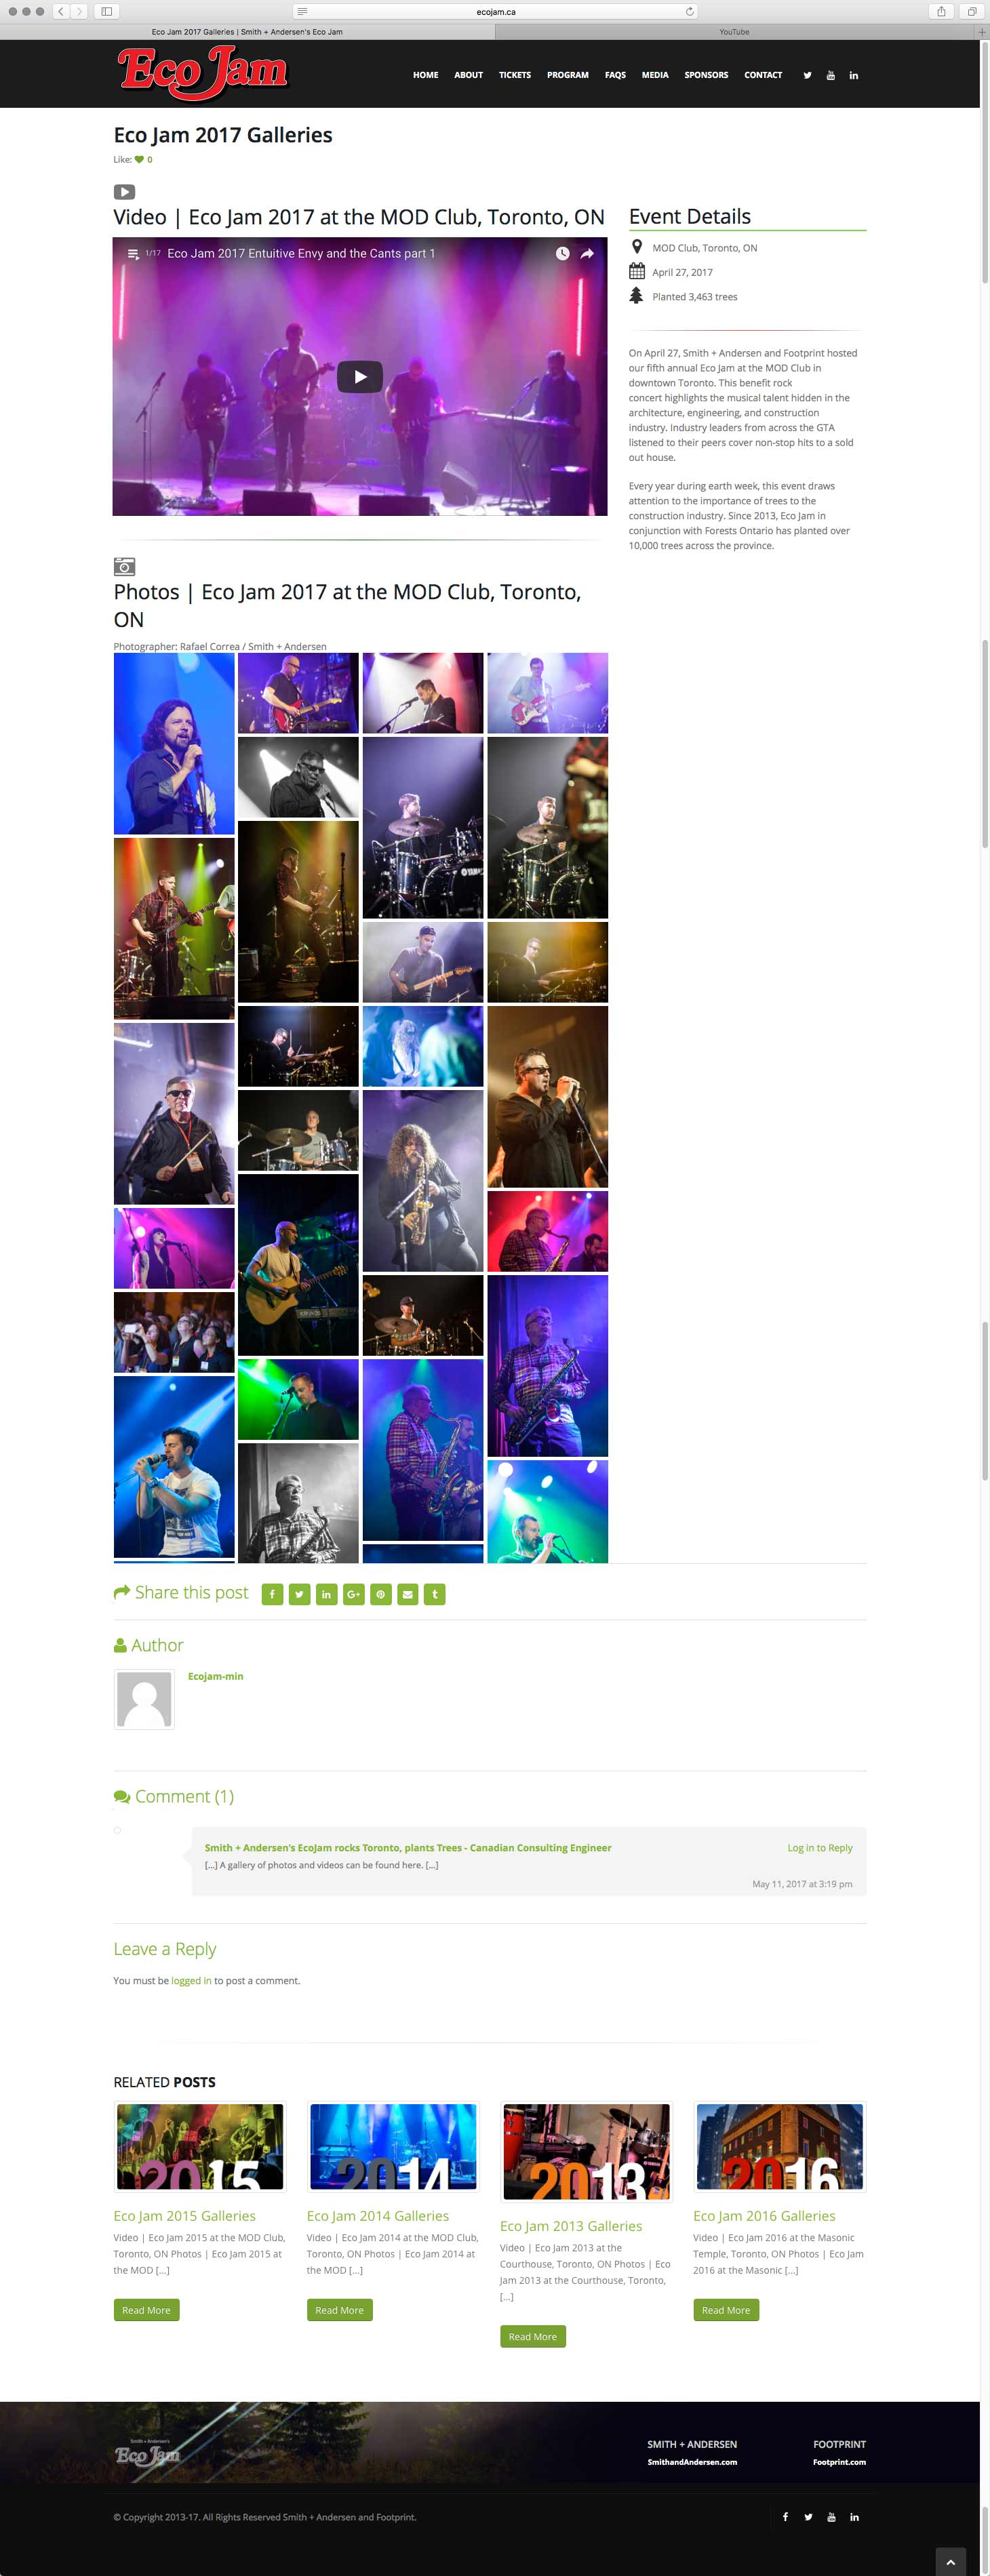 Eco Jam Media 2017 page